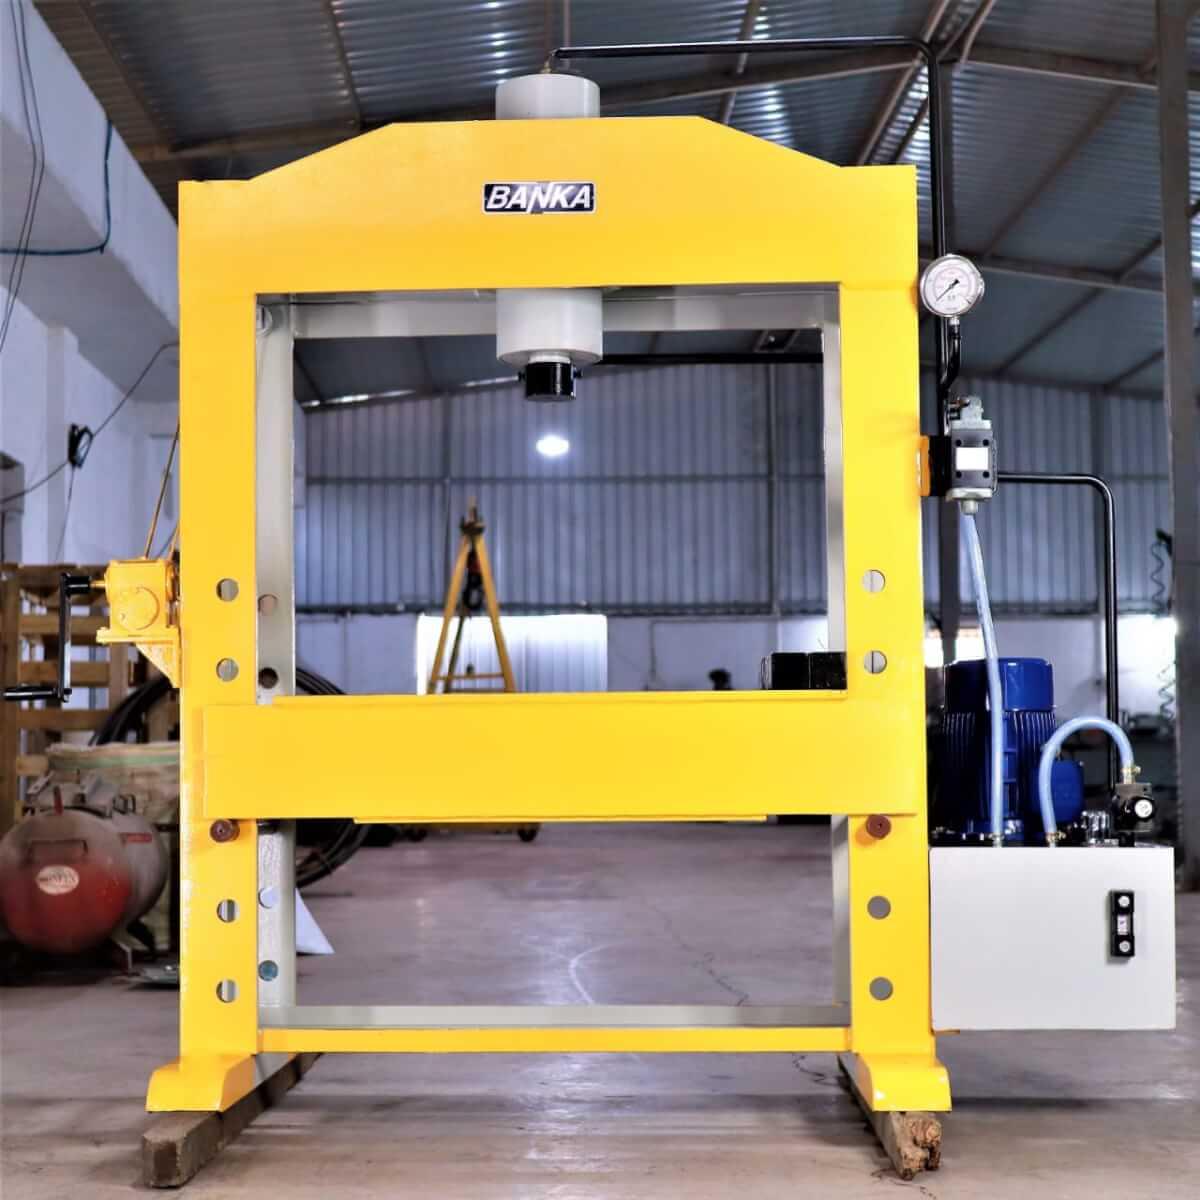 Hydraulic Press machine- Cylinder Machine -Pillar type Stand Press Hand Press Manual Punching 100 Ton Capacity Banka Machine